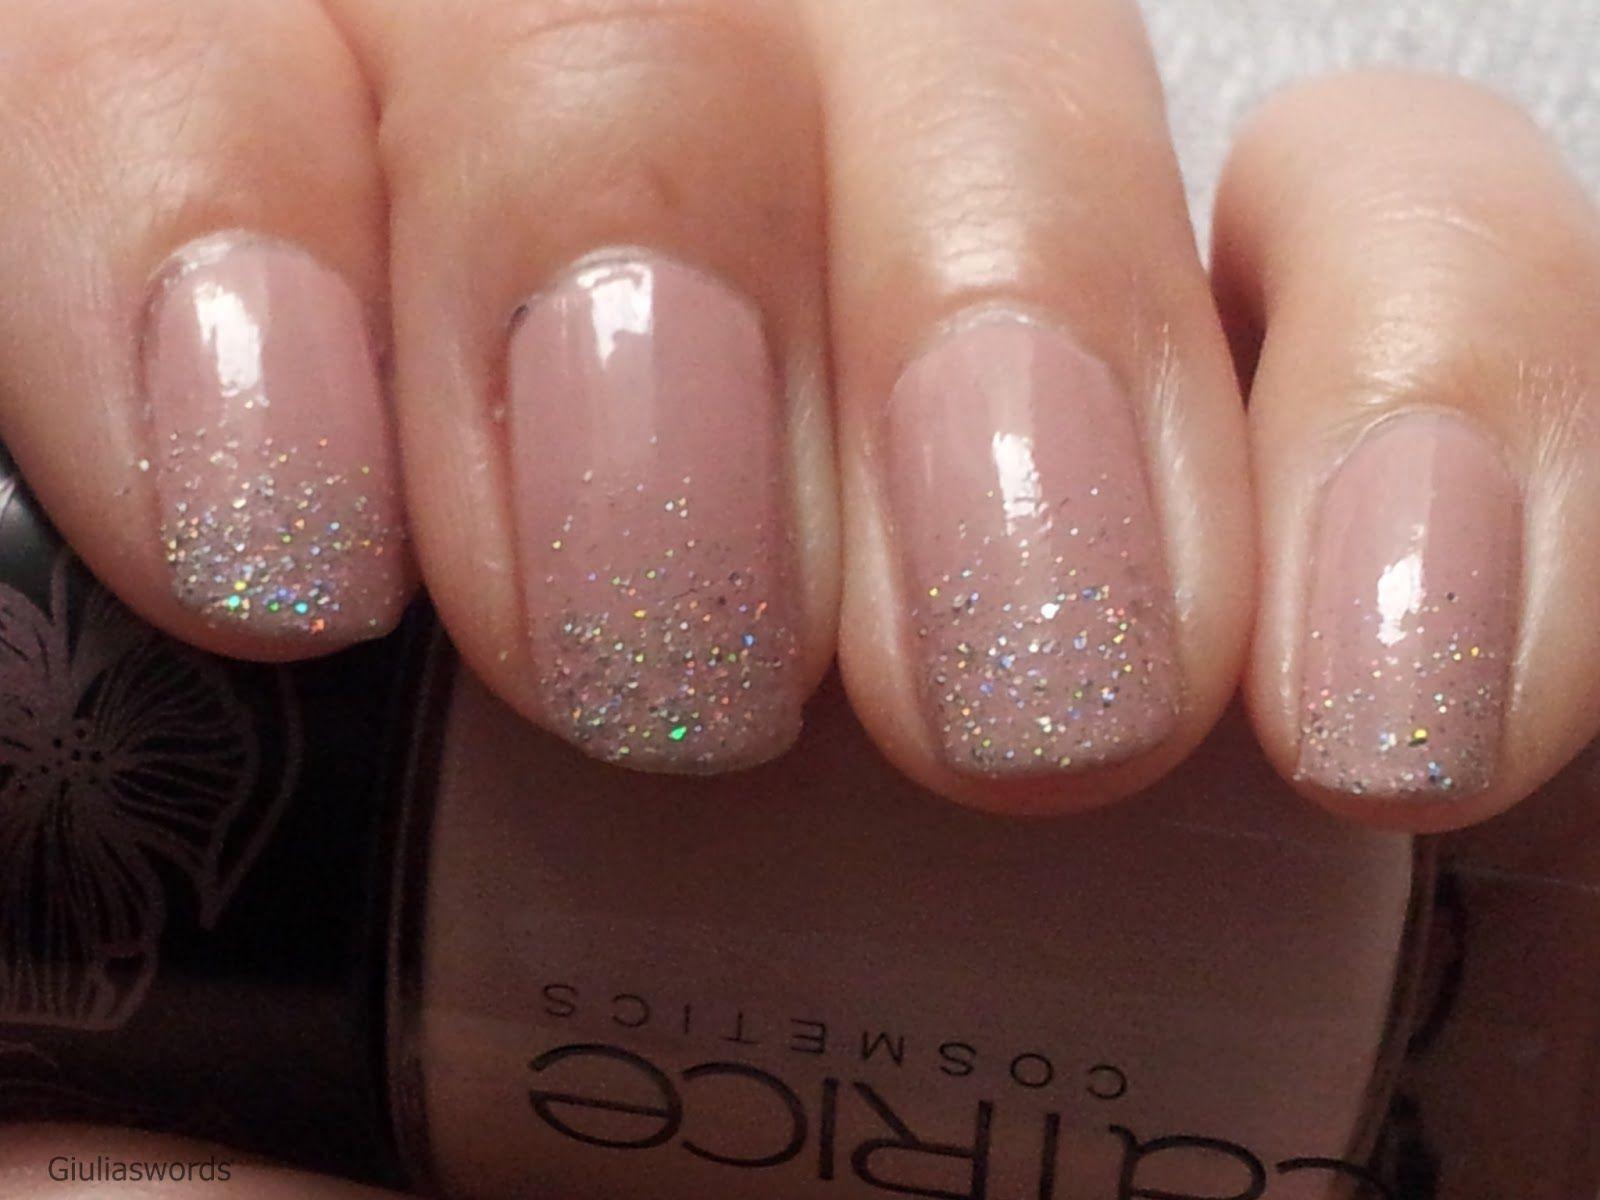 Nageldesign Elegant Dezent  Nagellack mit glitzer dezent •Nails•